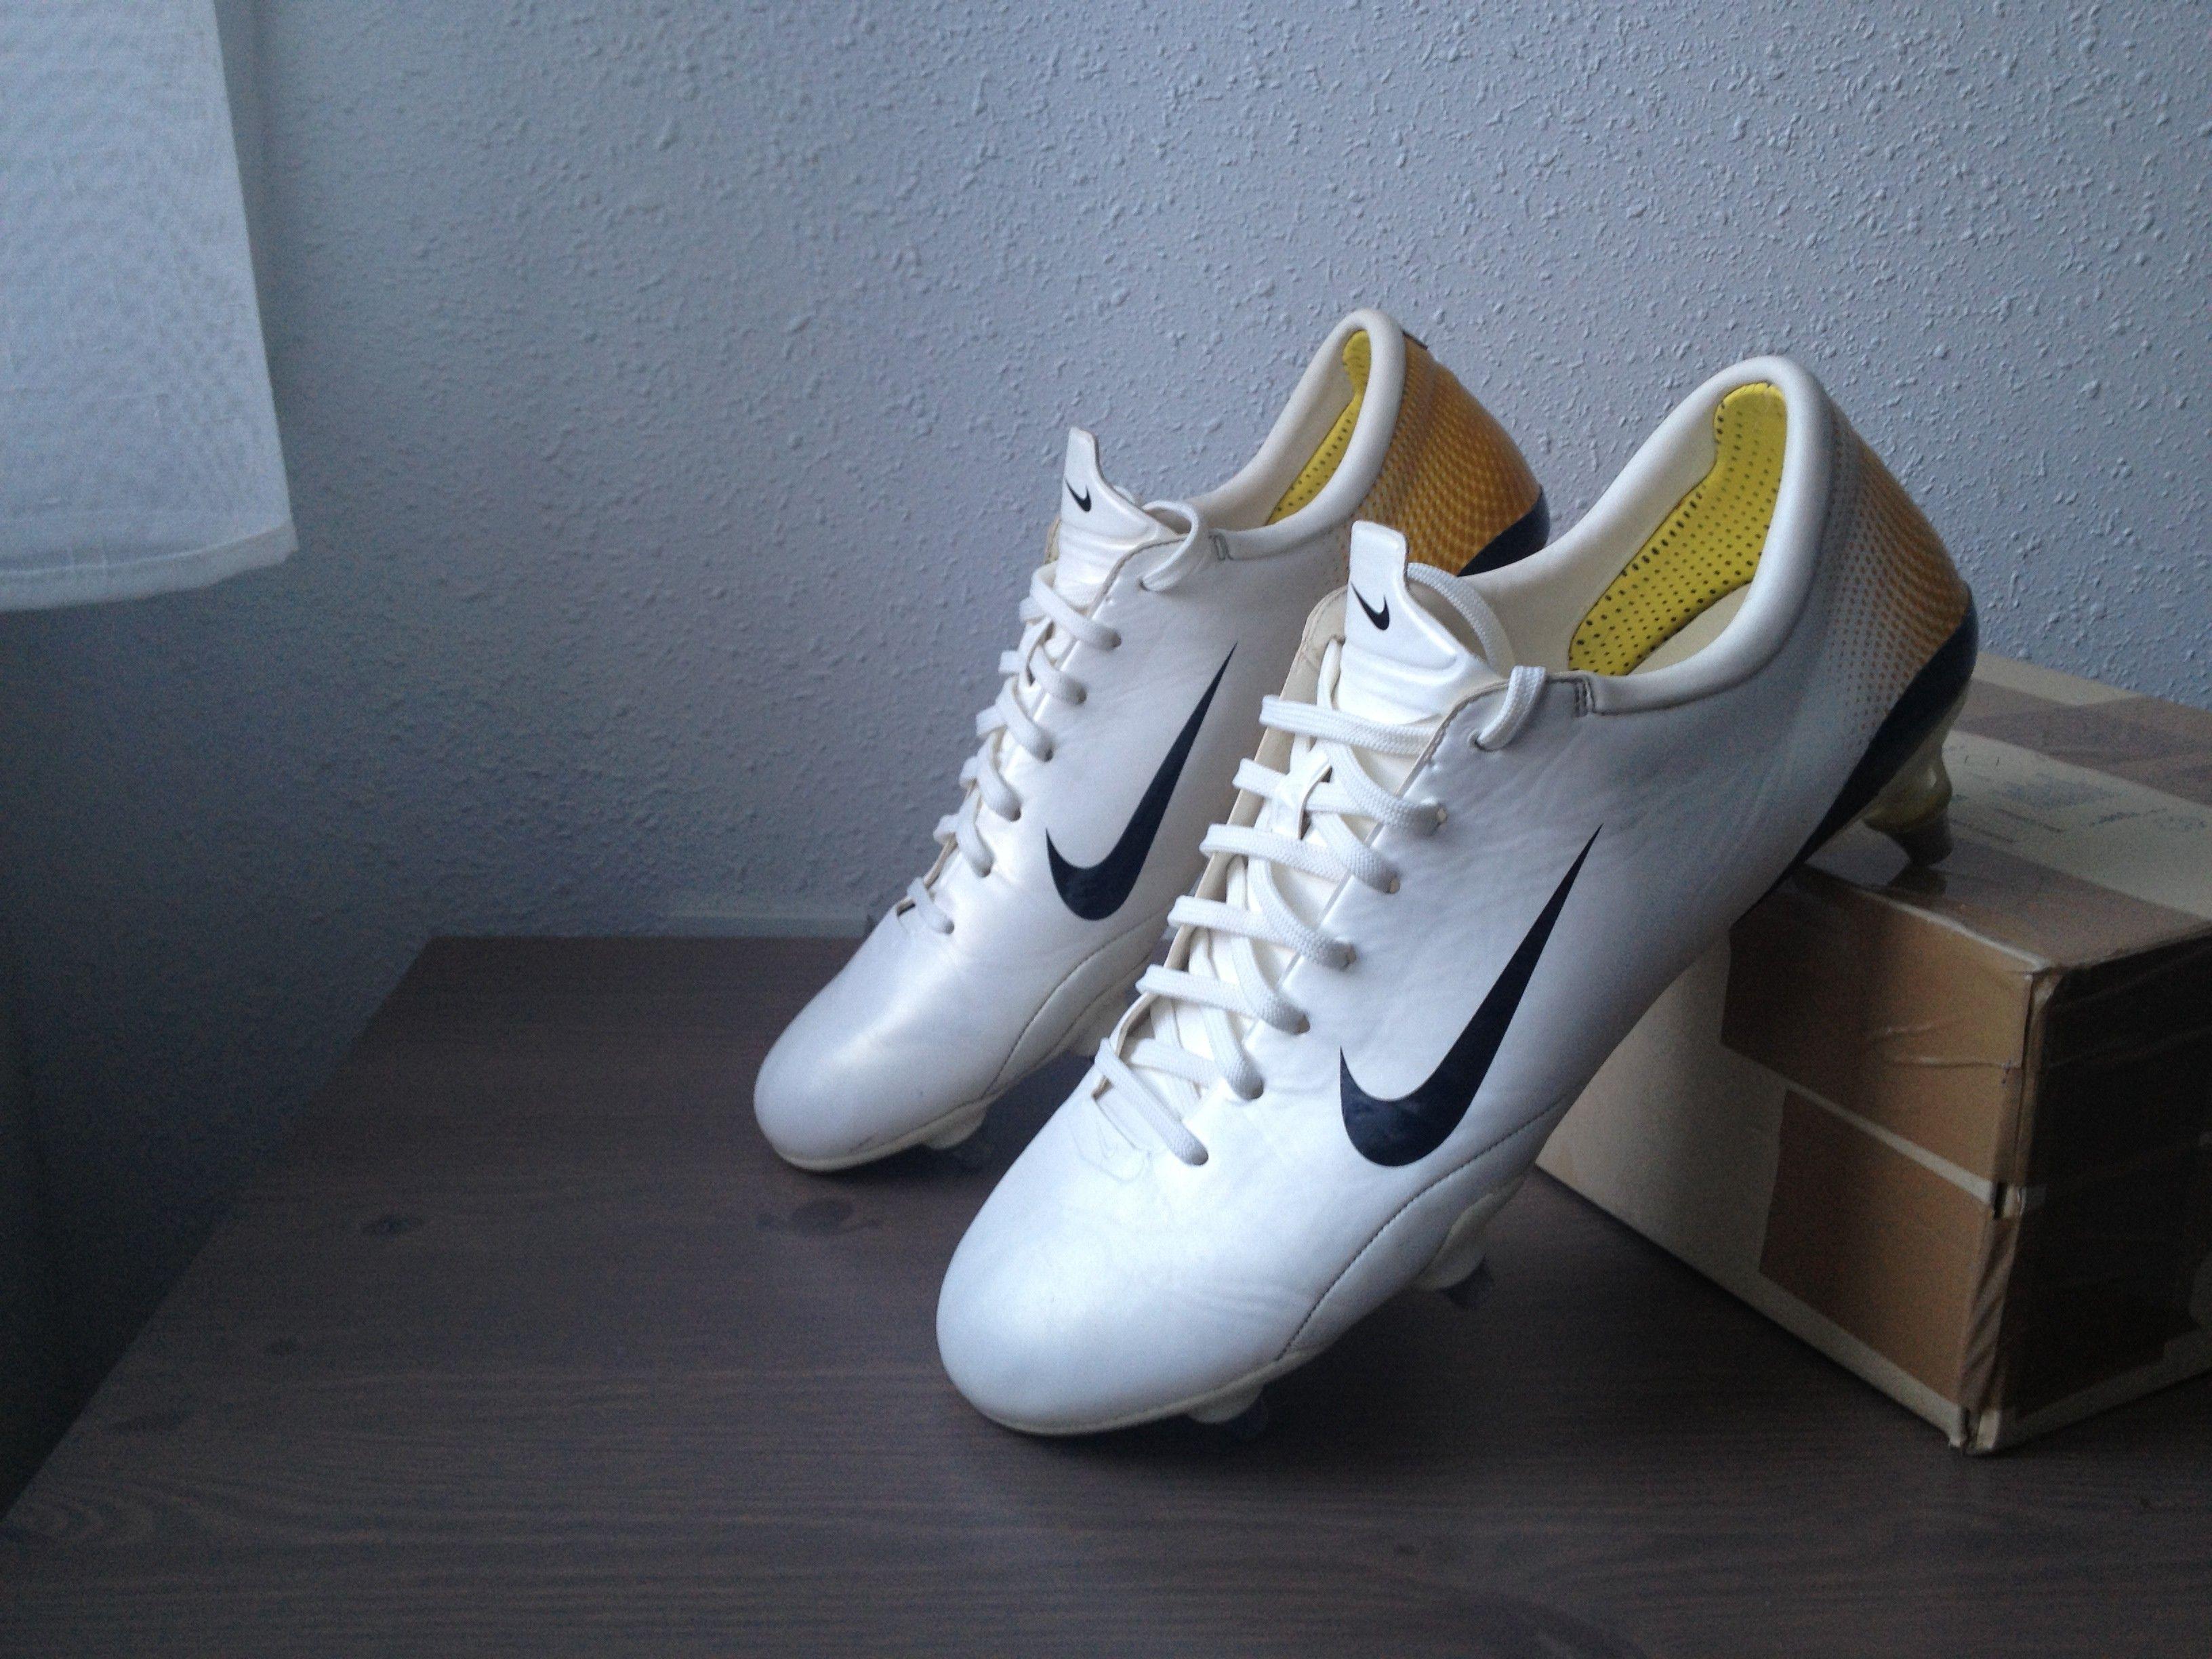 Nike De 2006 Zapatos Pesquisa GoogleSukan Fútbol Mercurial IvbY76mgyf